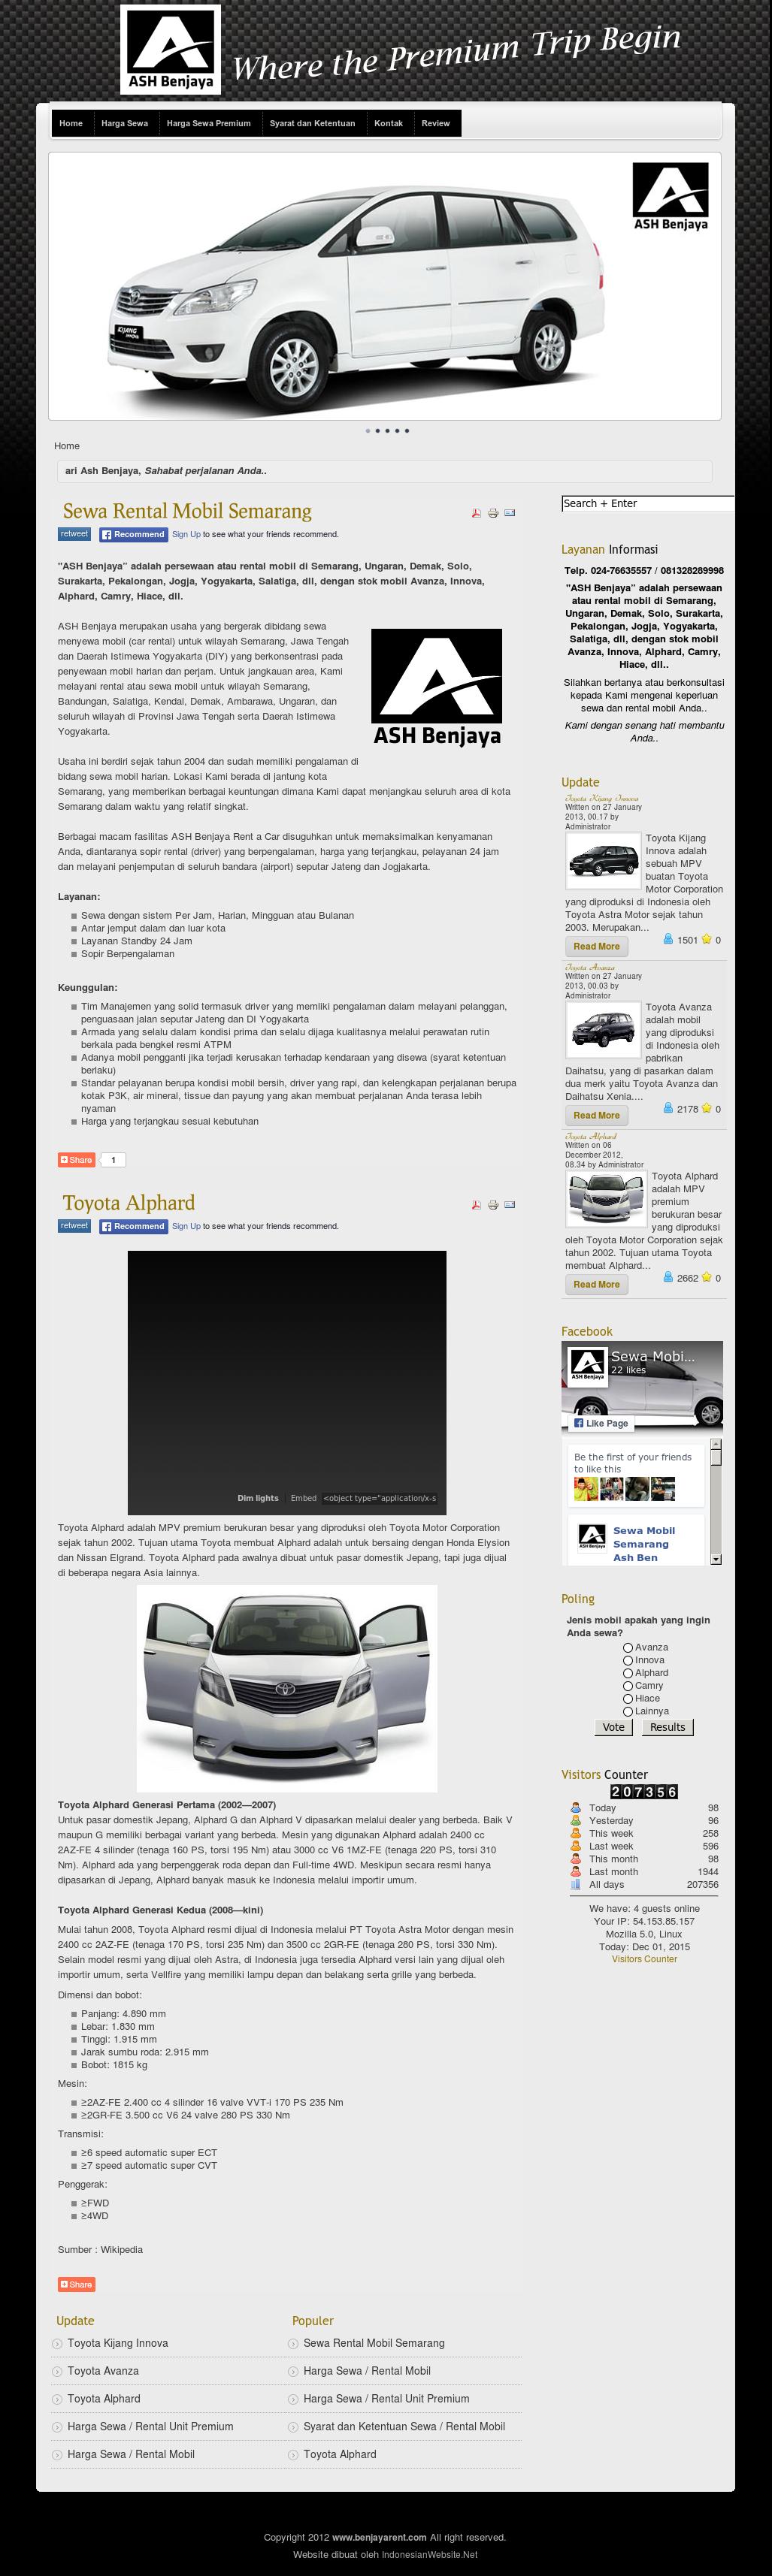 Sewa Mobil Semarang Ash Ben Jaya S Competitors Revenue Number Of Employees Funding Acquisitions News Owler Company Profile